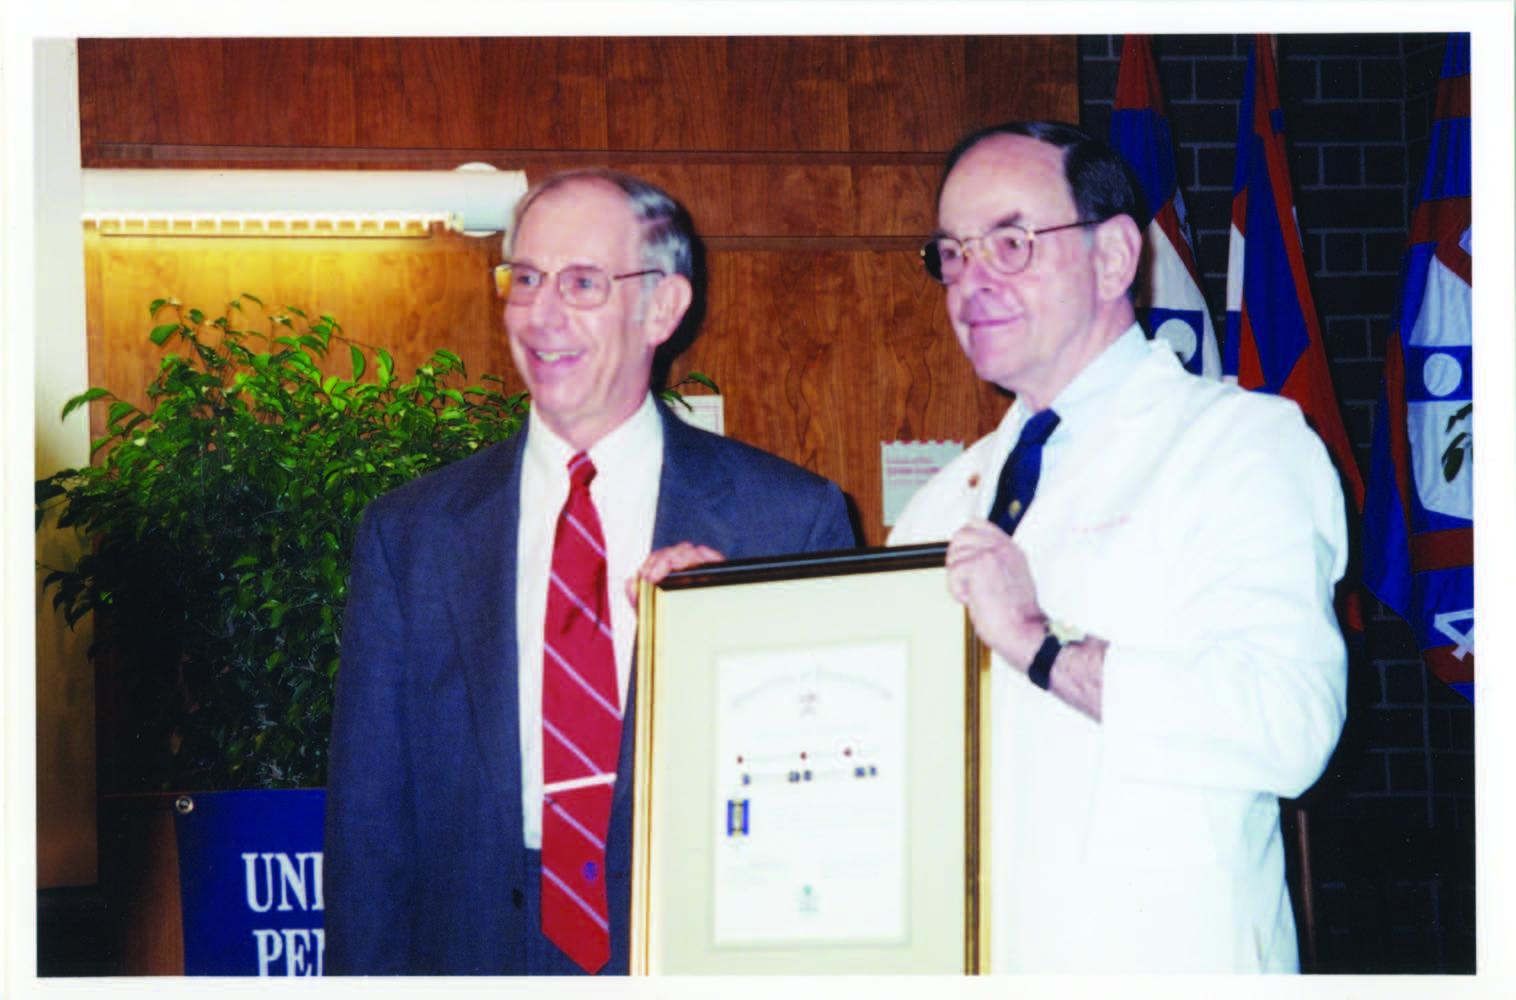 Dr. Albert receiving the Distinguished Alumni Award in 2001.